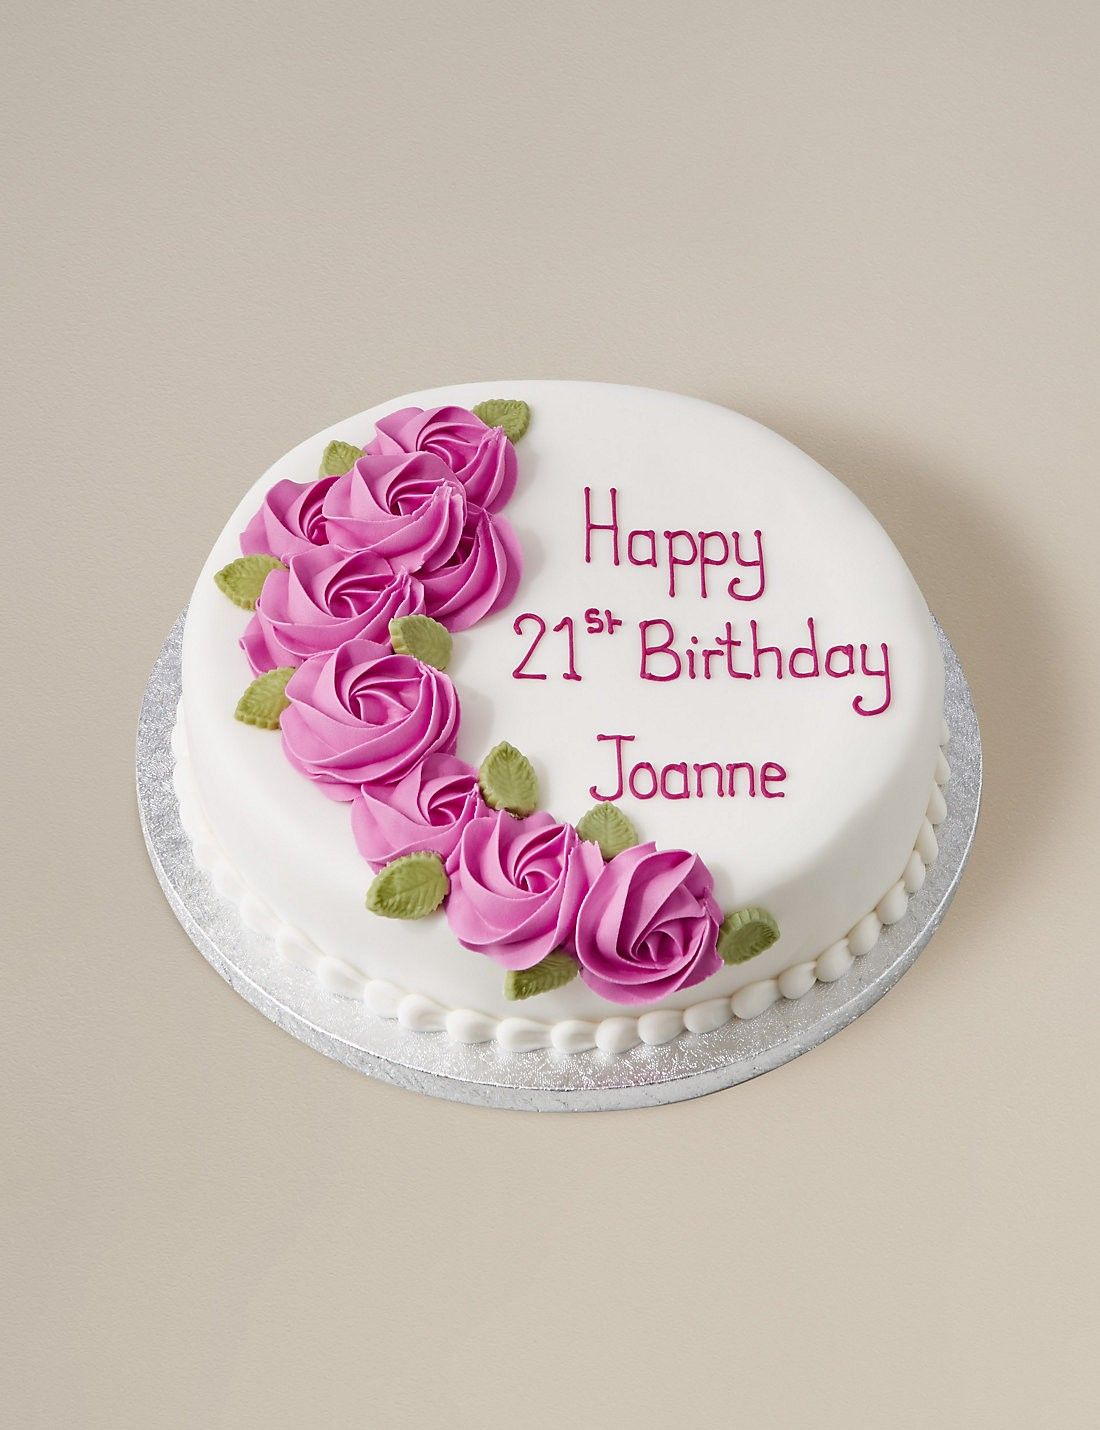 Pin By Suman Zulfiqar On Birthday Cakes Pinterest Birthday Cakes